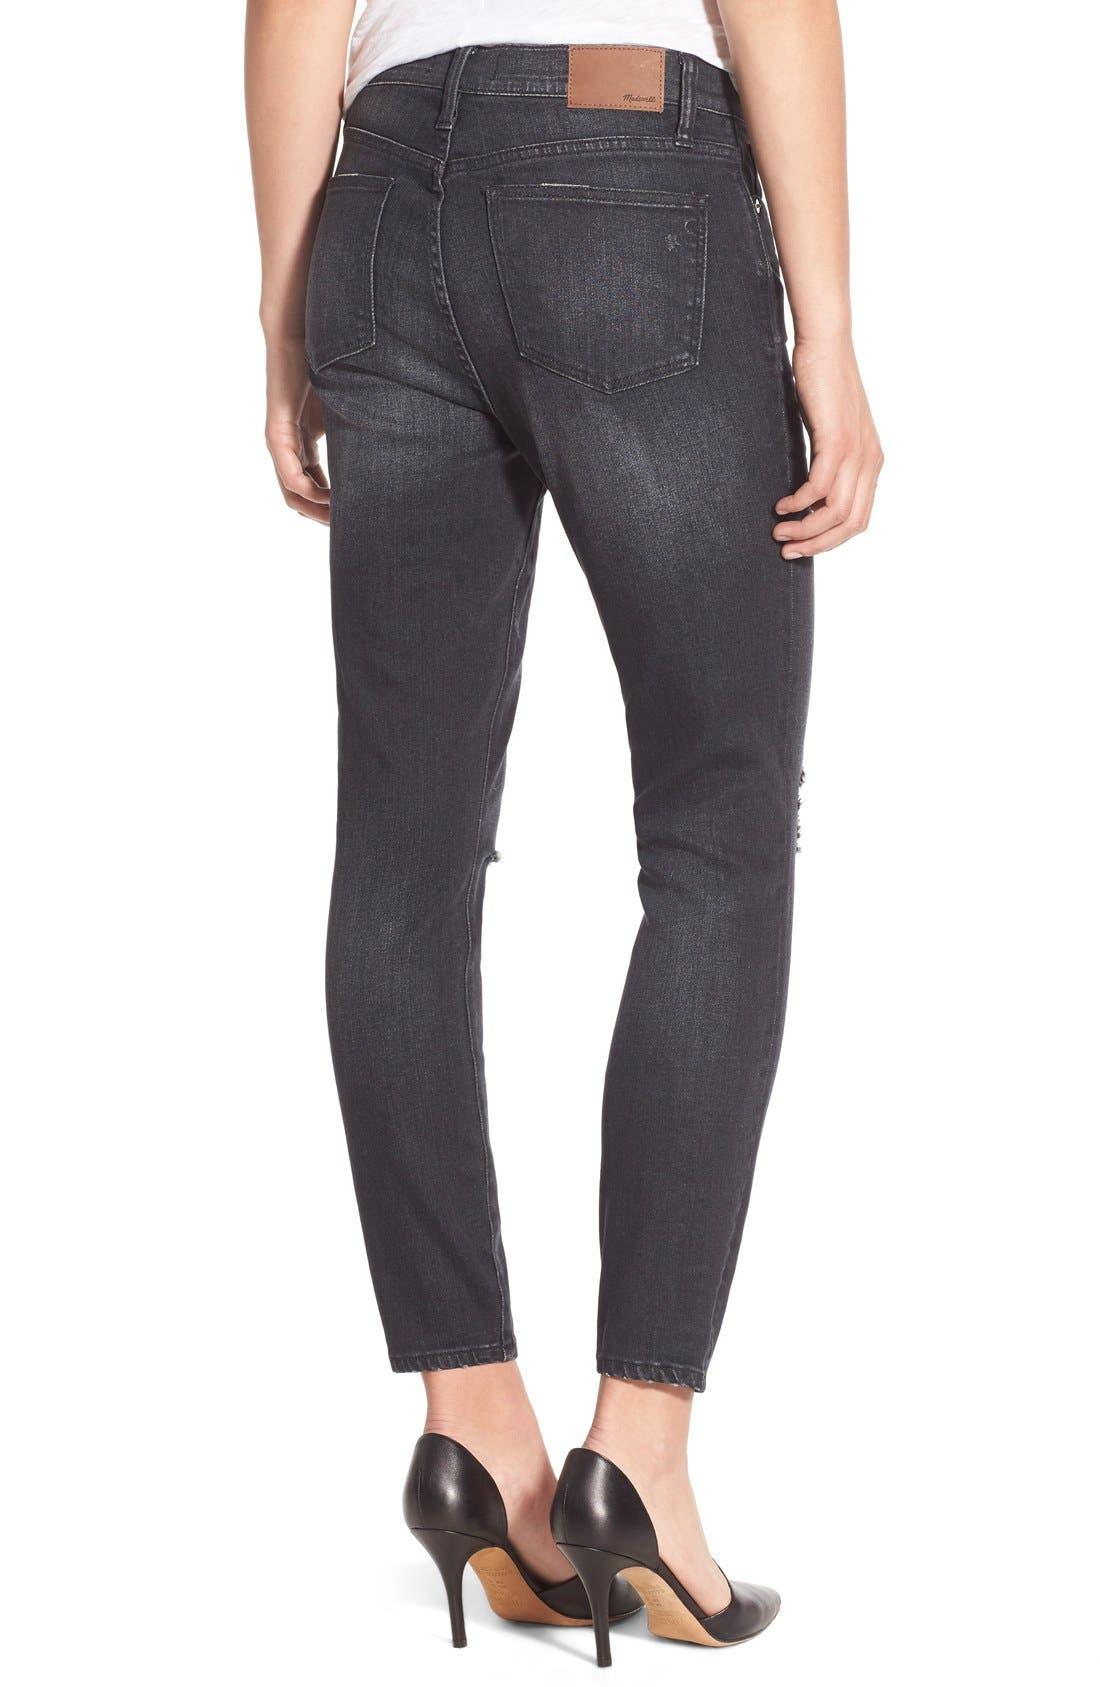 Alternate Image 3  - Madewell 'High Riser' Skinny Skinny Jeans (Kincaid Wash)